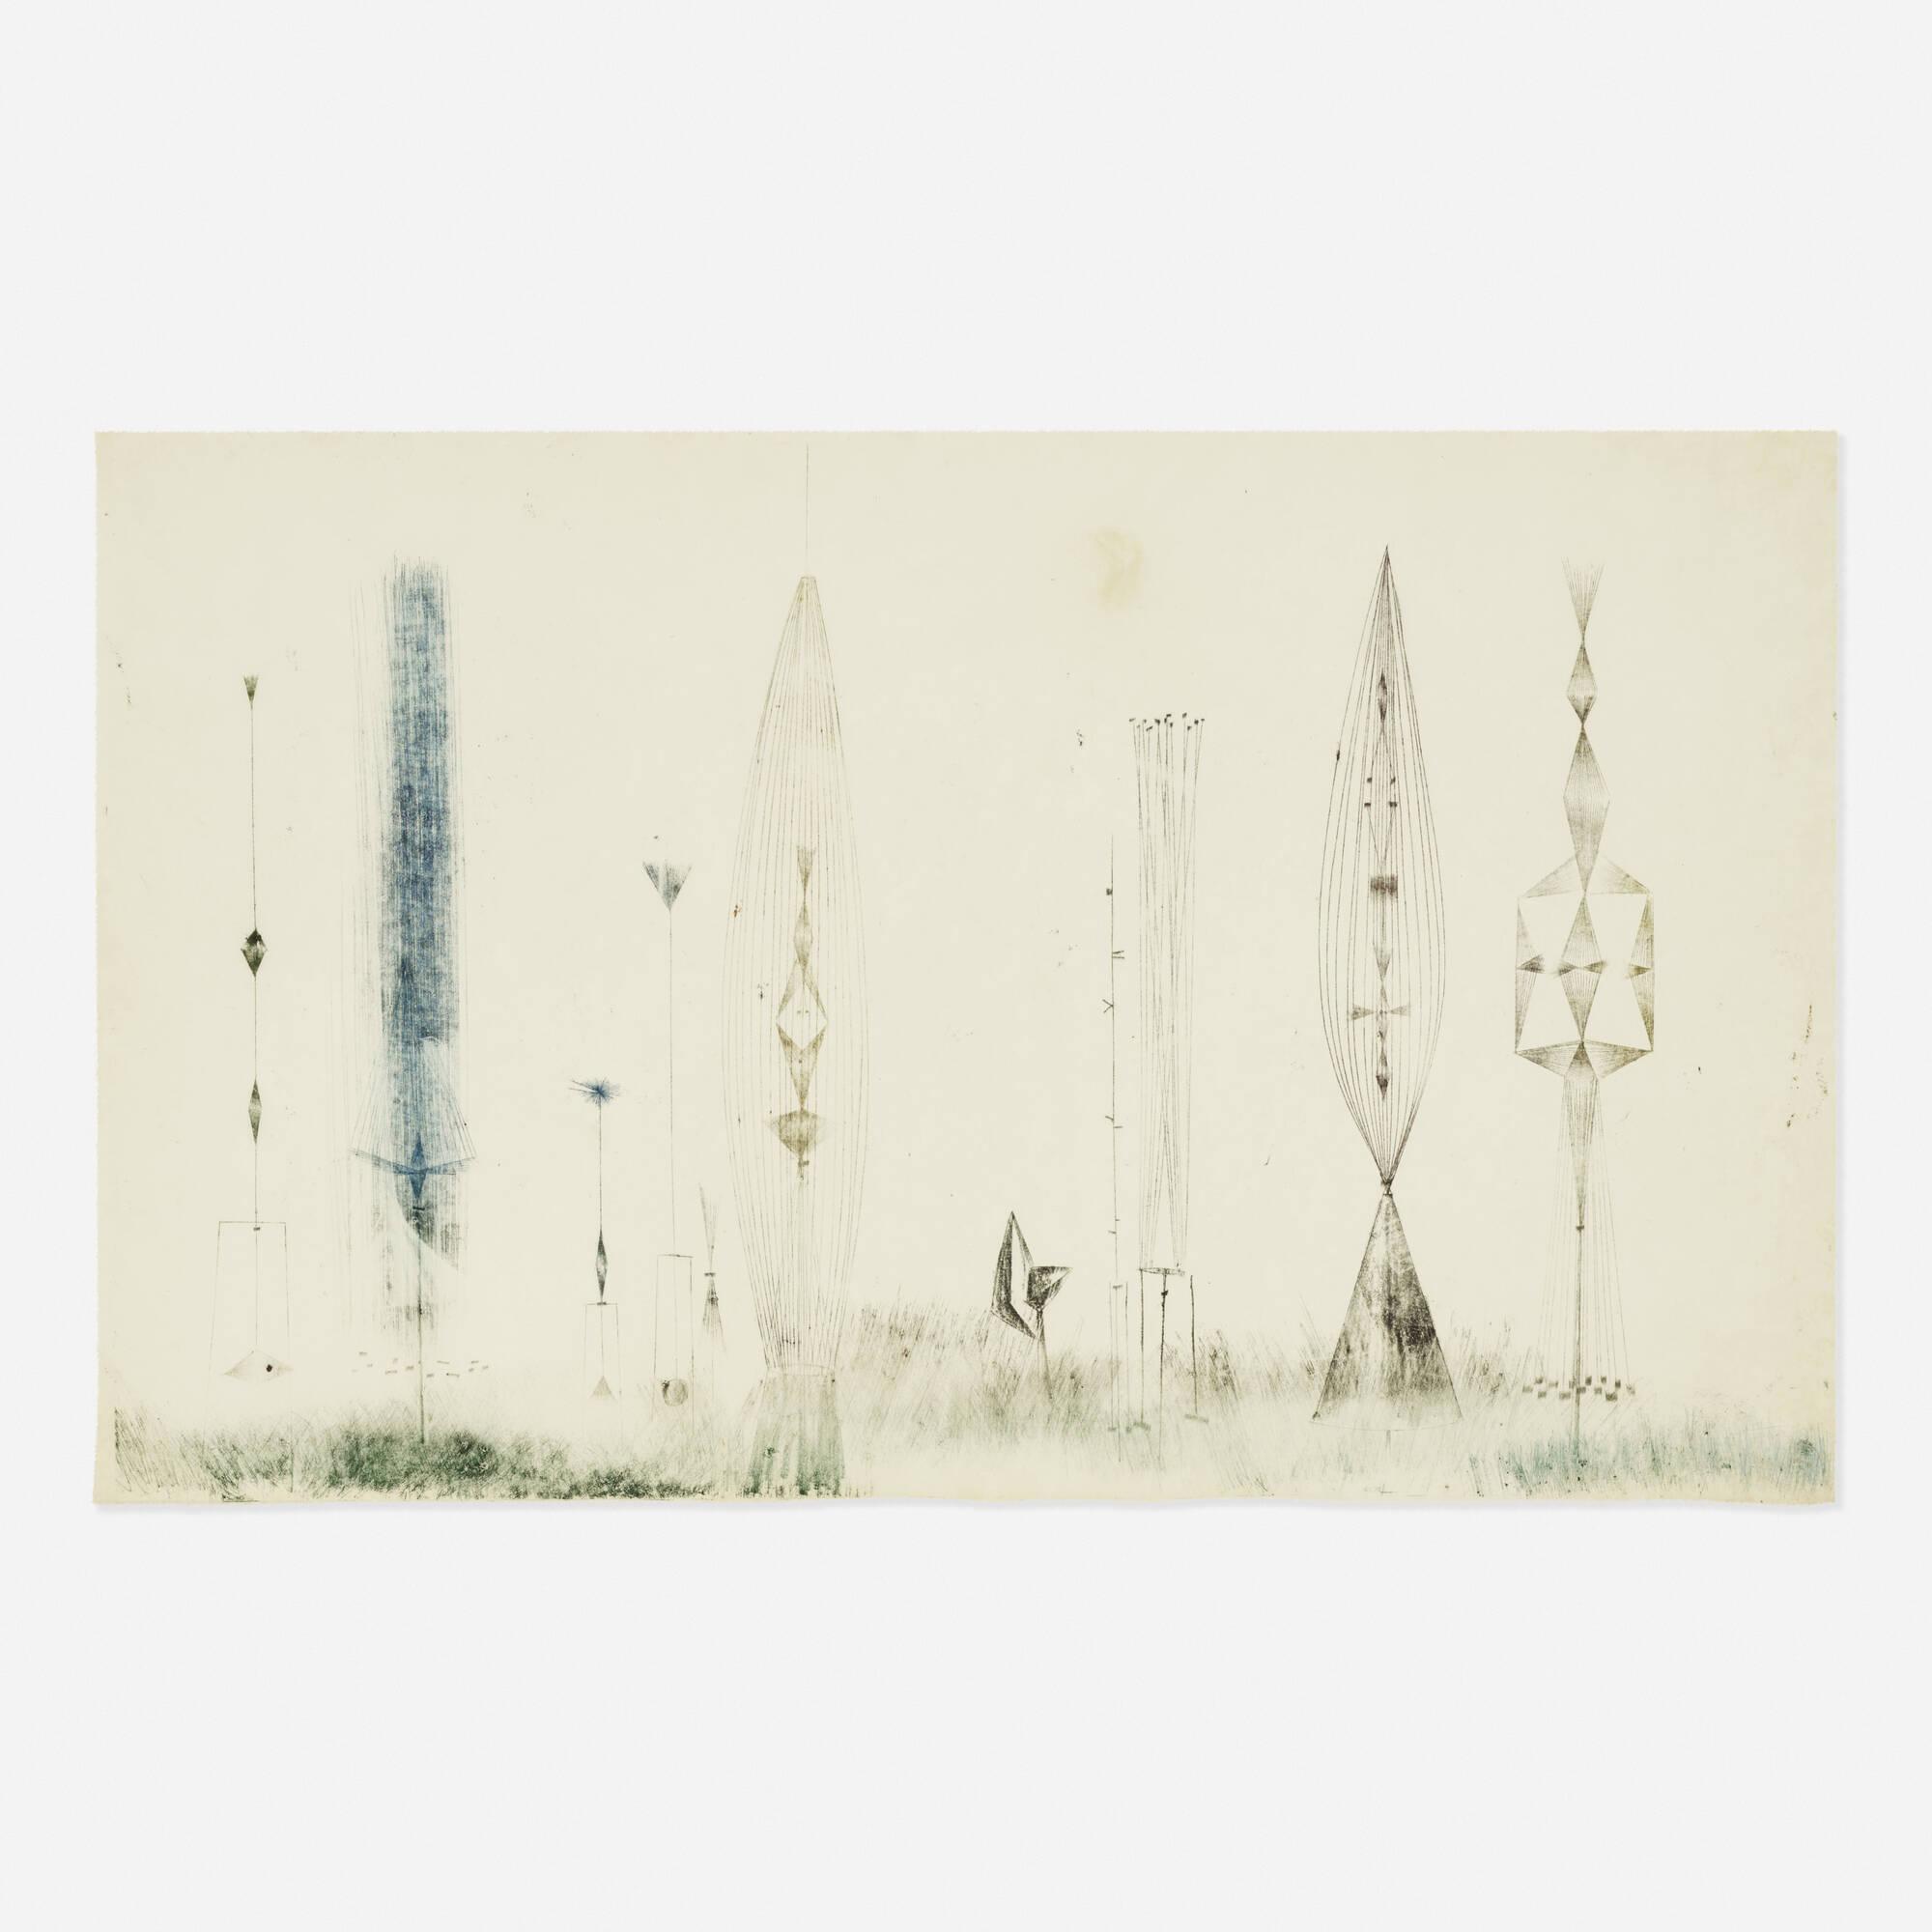 189: Harry Bertoia / Untitled (Monotype) (1 of 1)